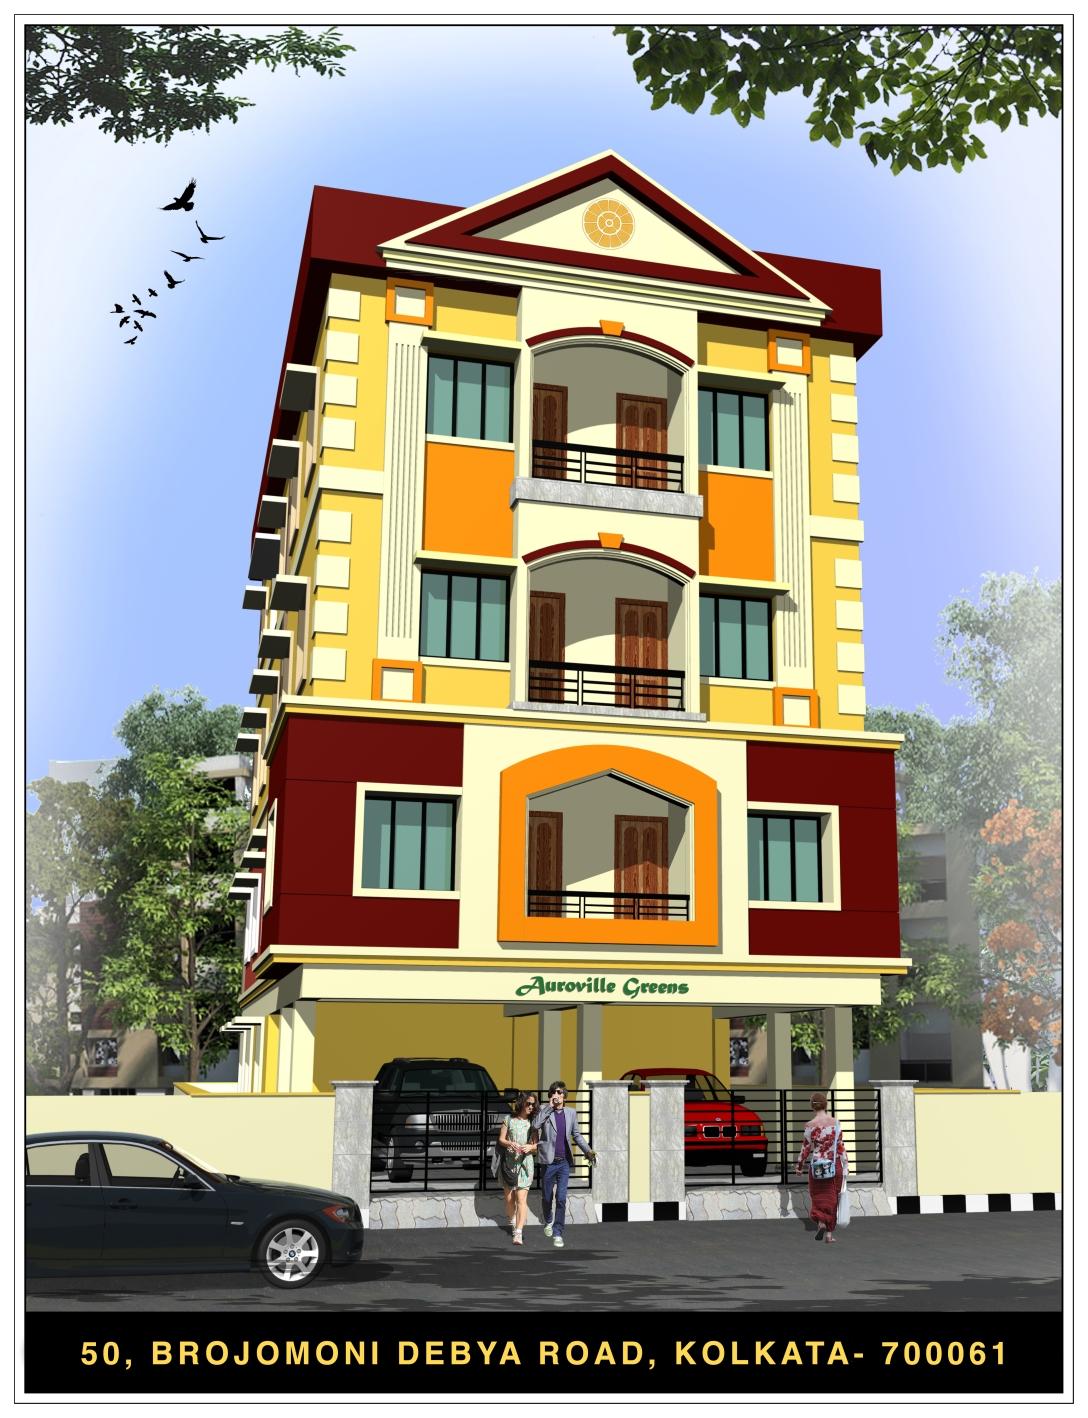 Building Design-Page 1